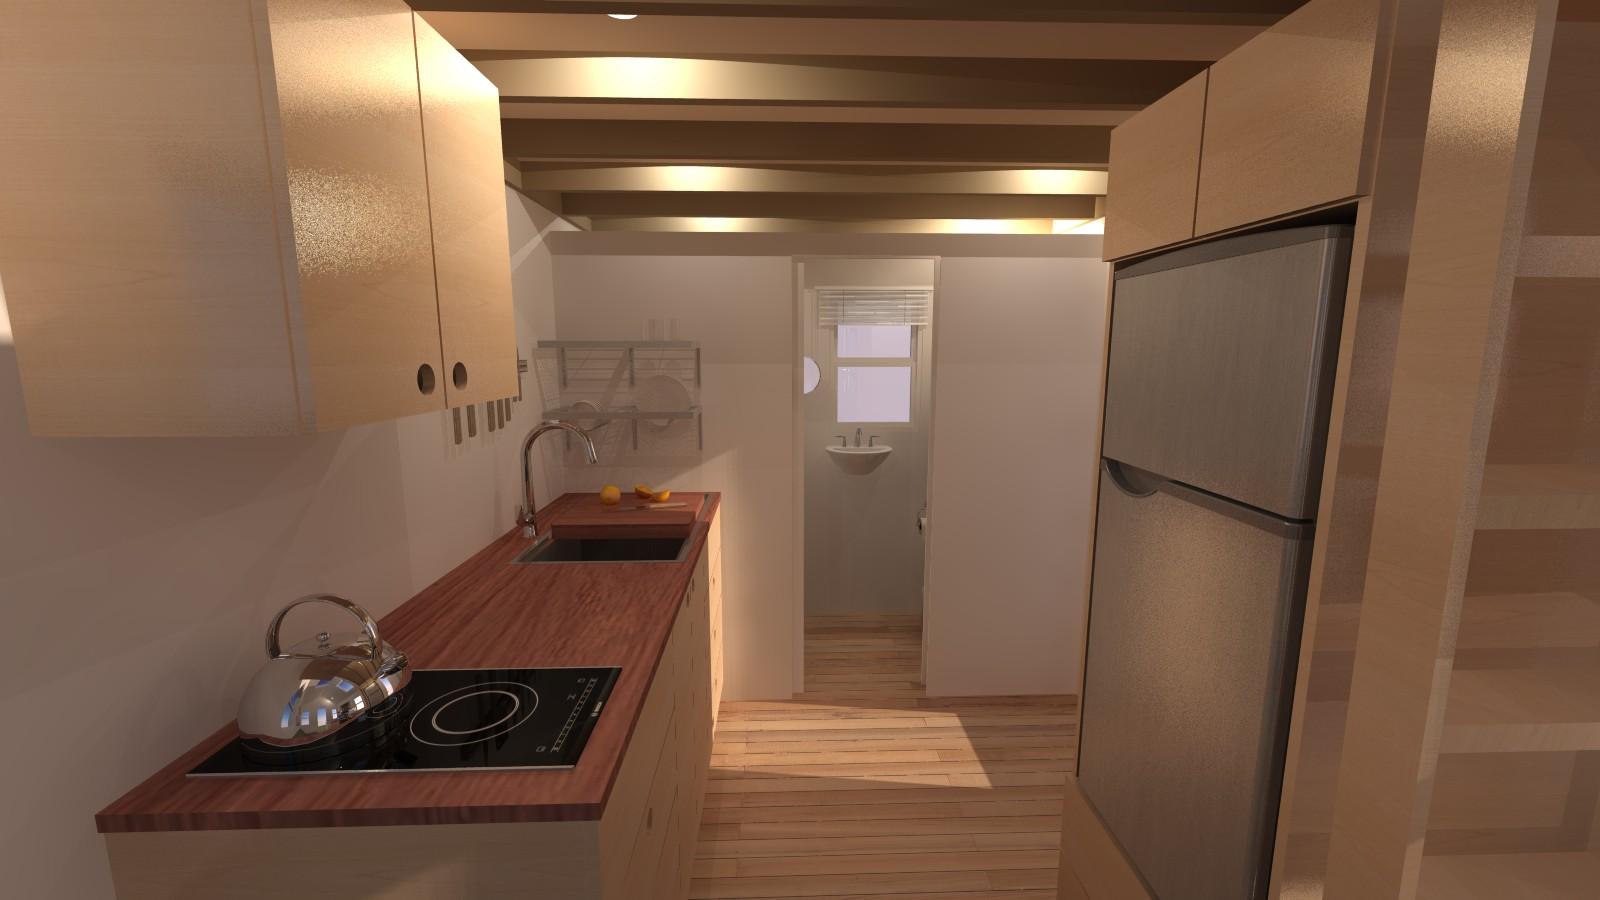 Calpella 18 Tiny House Kitchen